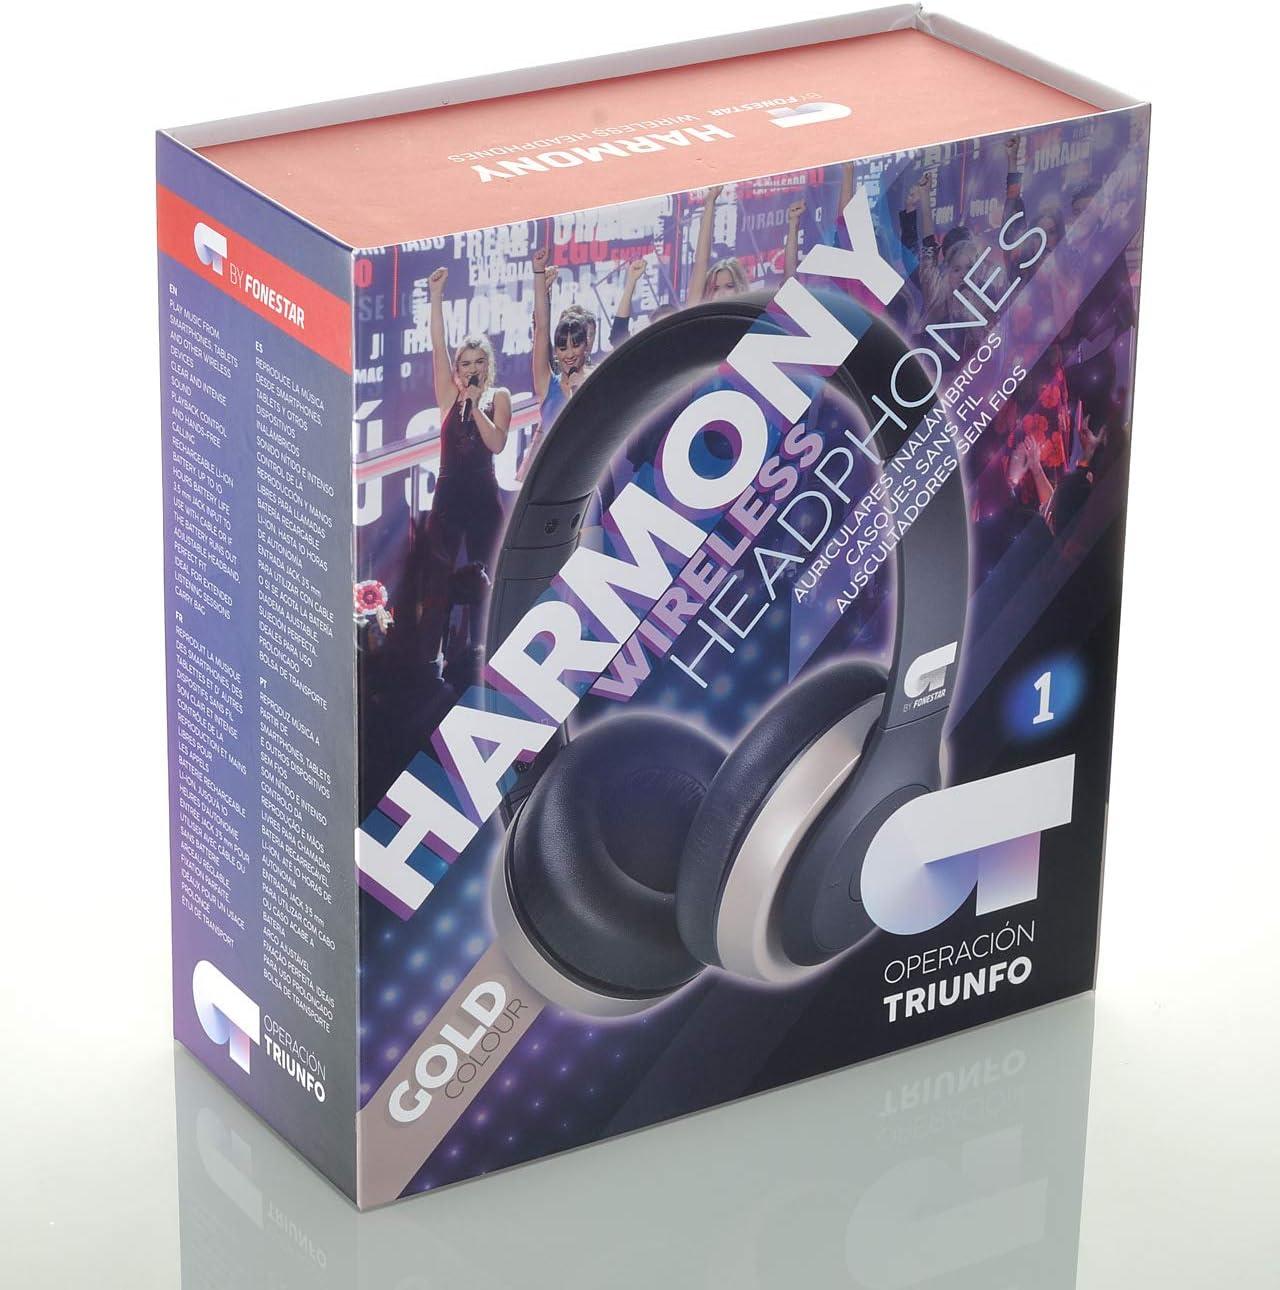 Operacion Triunfo OT Harmony-D Fonestar Auriculares Bluetooth Dorado: Amazon.es: Electrónica